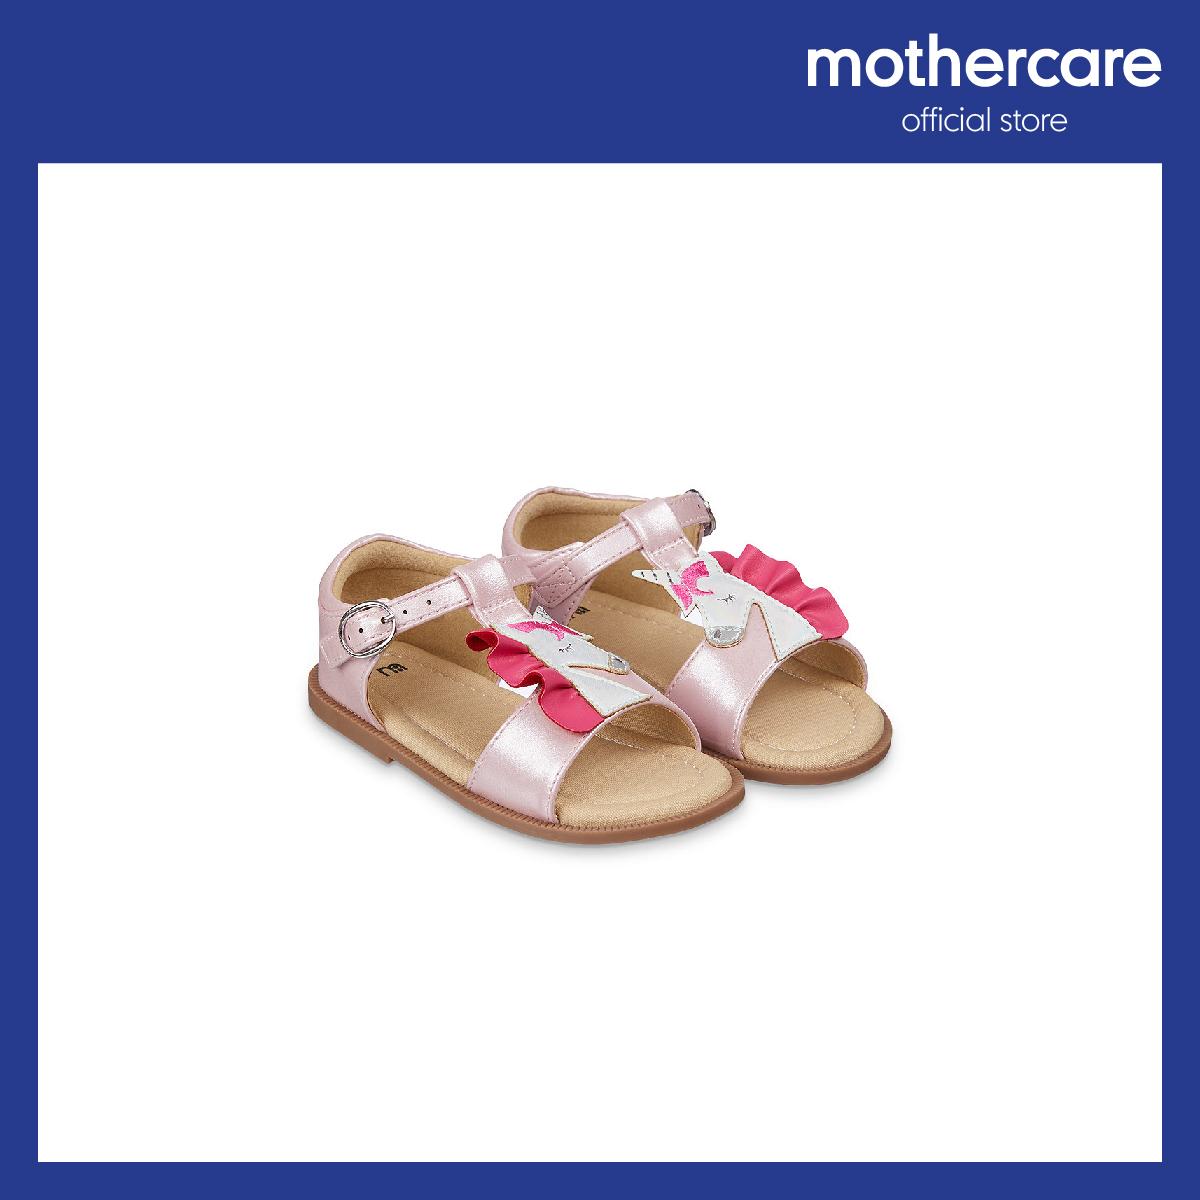 Girls Sandals - Buy Girls Sandals at